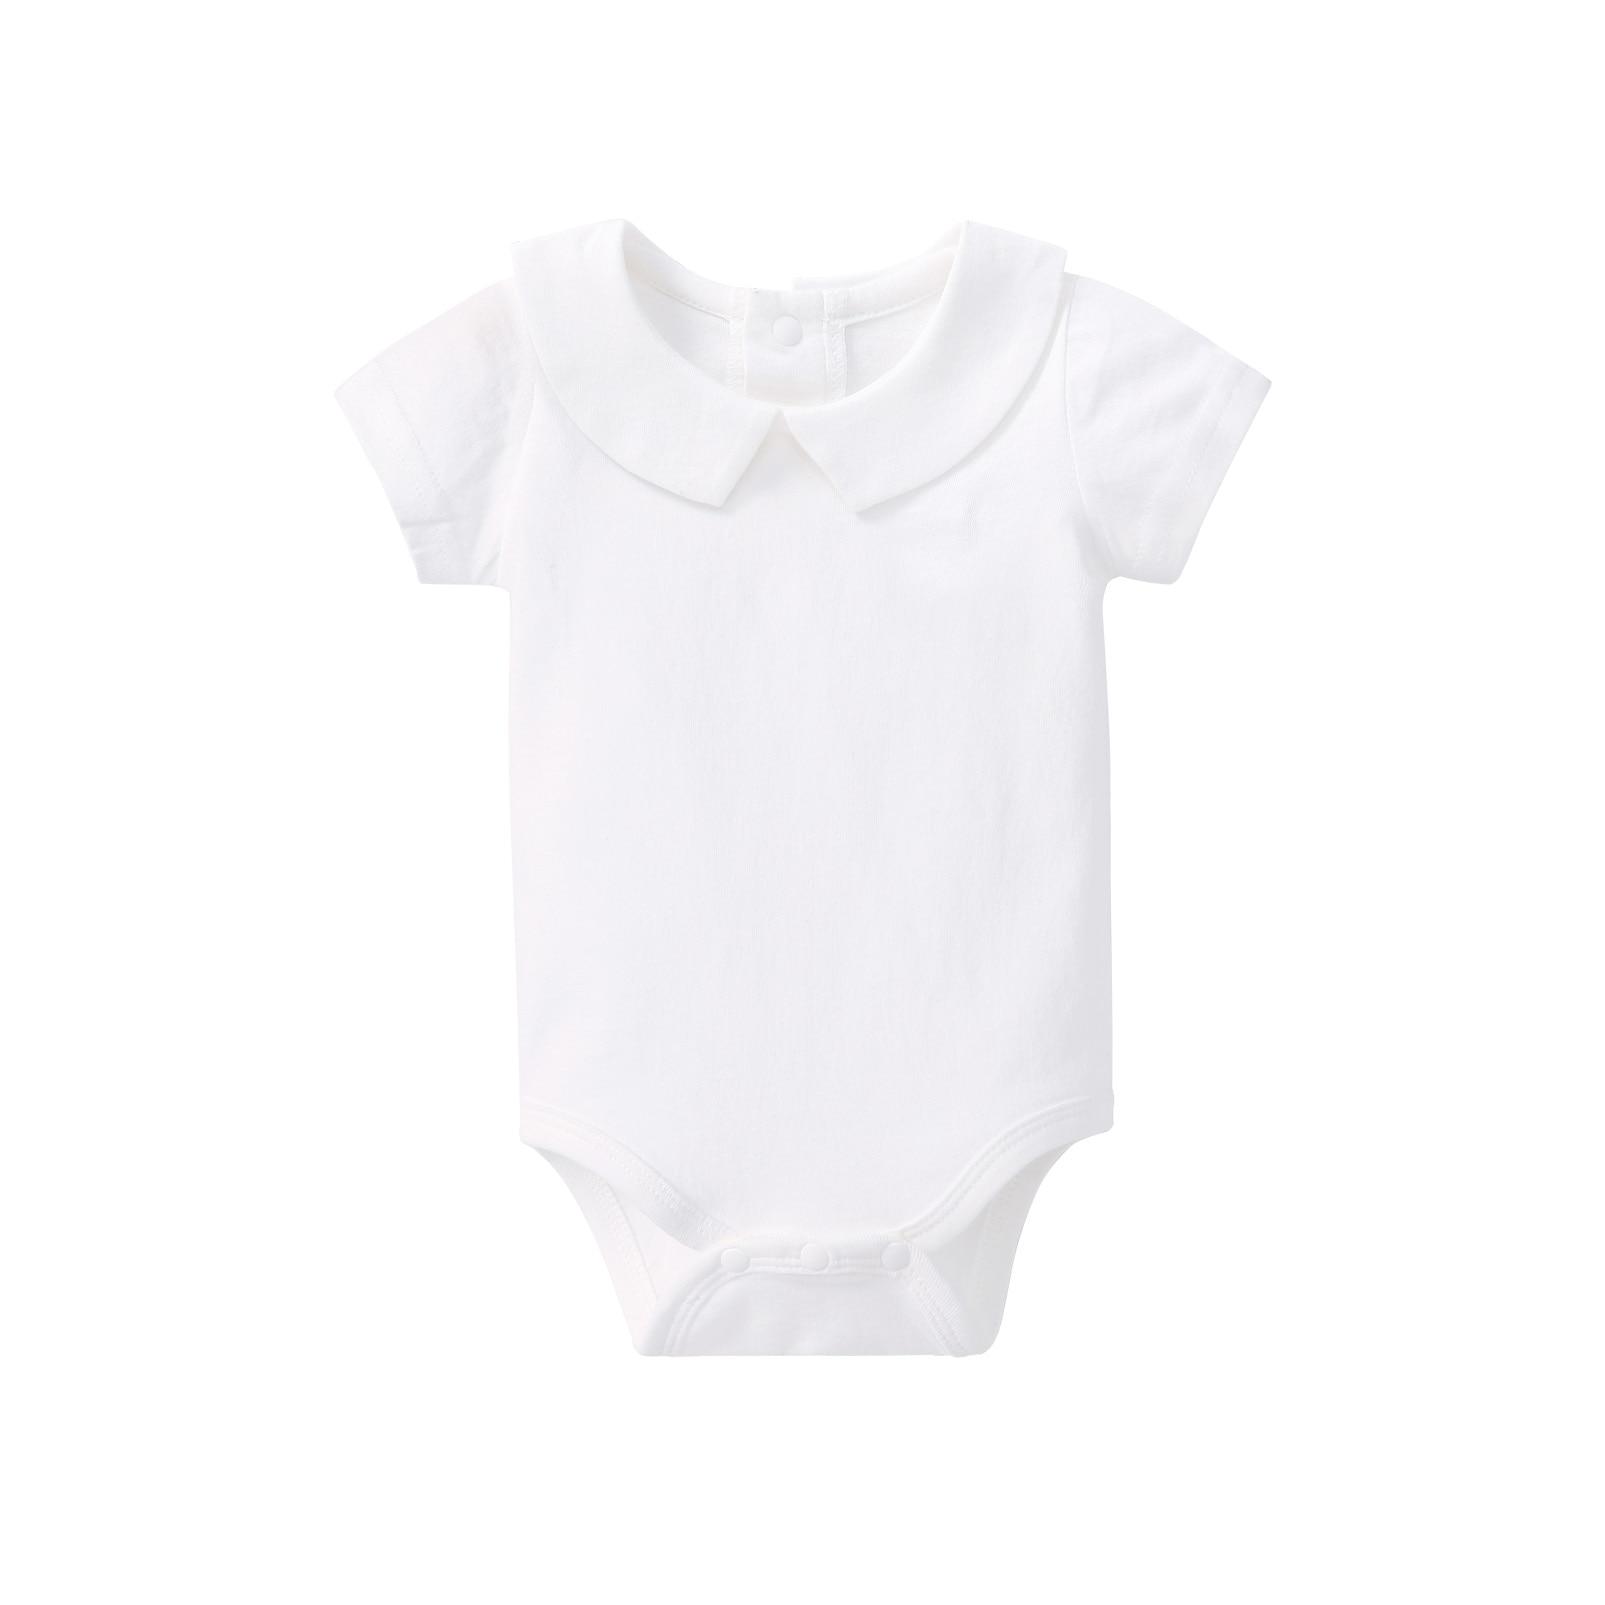 Pureborn Newborn Baby Girl Bodysuit Organic Cotton Baby Onesies Peter-pan Collar Solid Basic Short Sleeve Summer Clothes